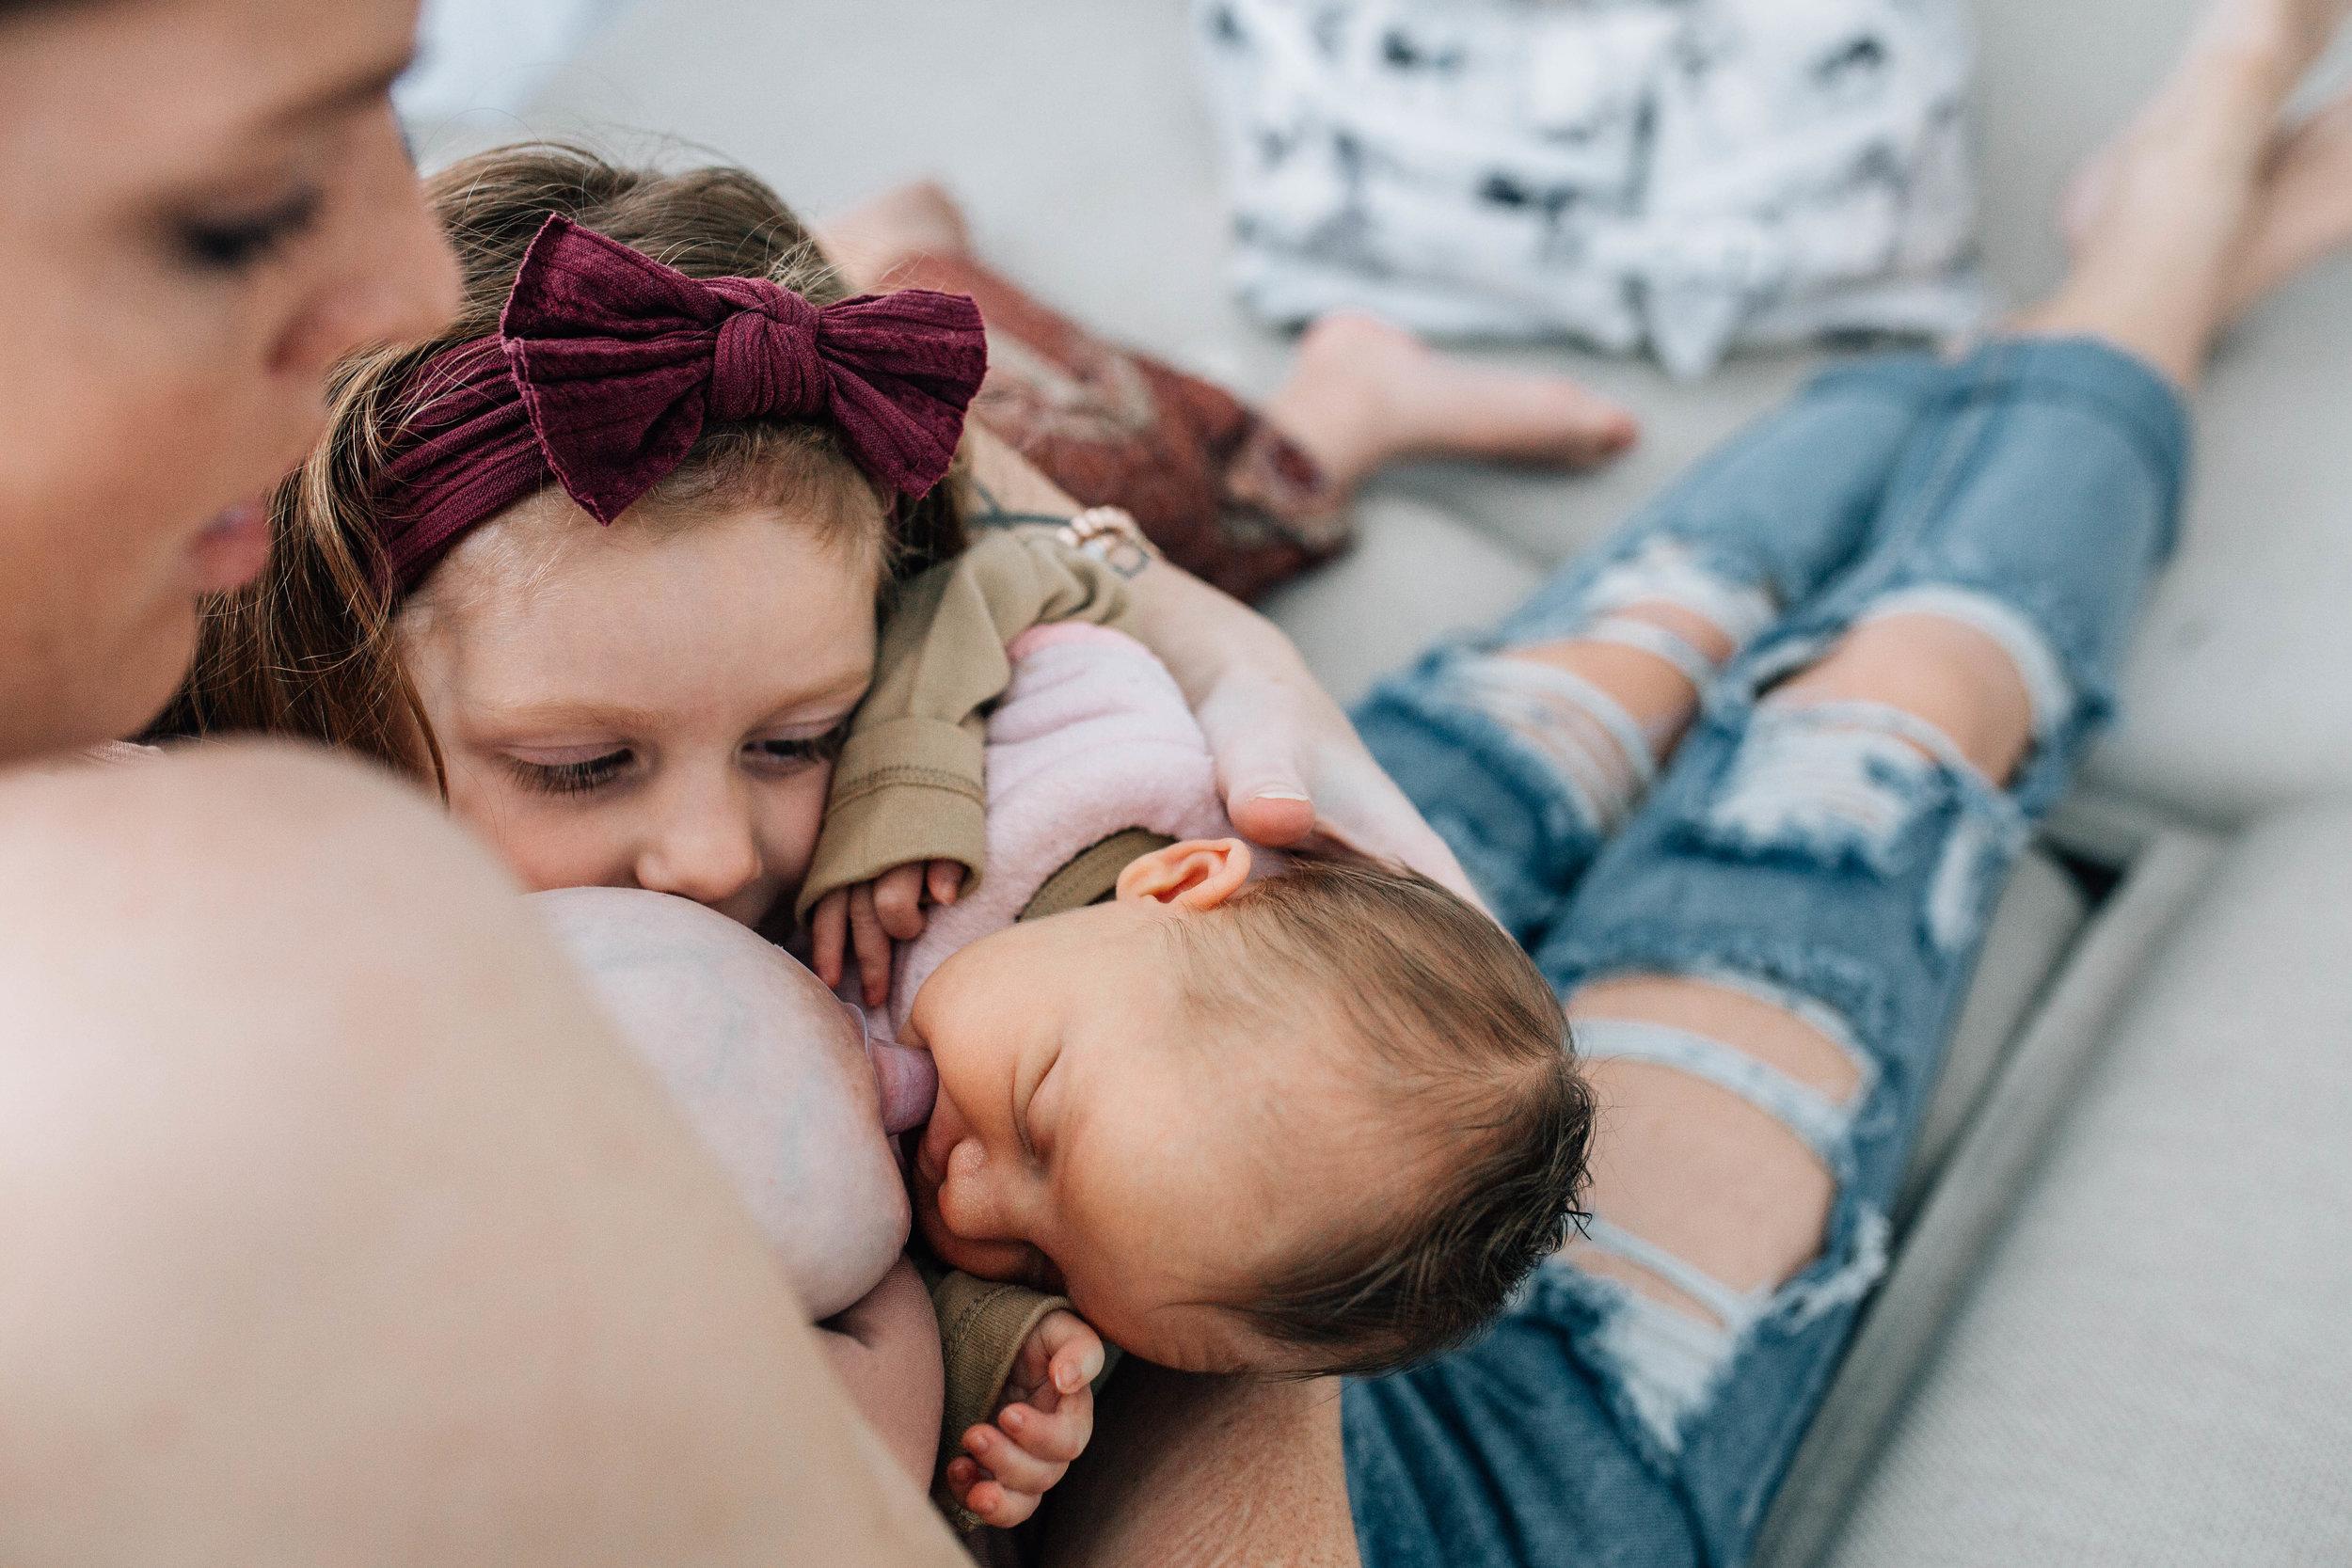 baby-breastfeeding-and-sister.jpg